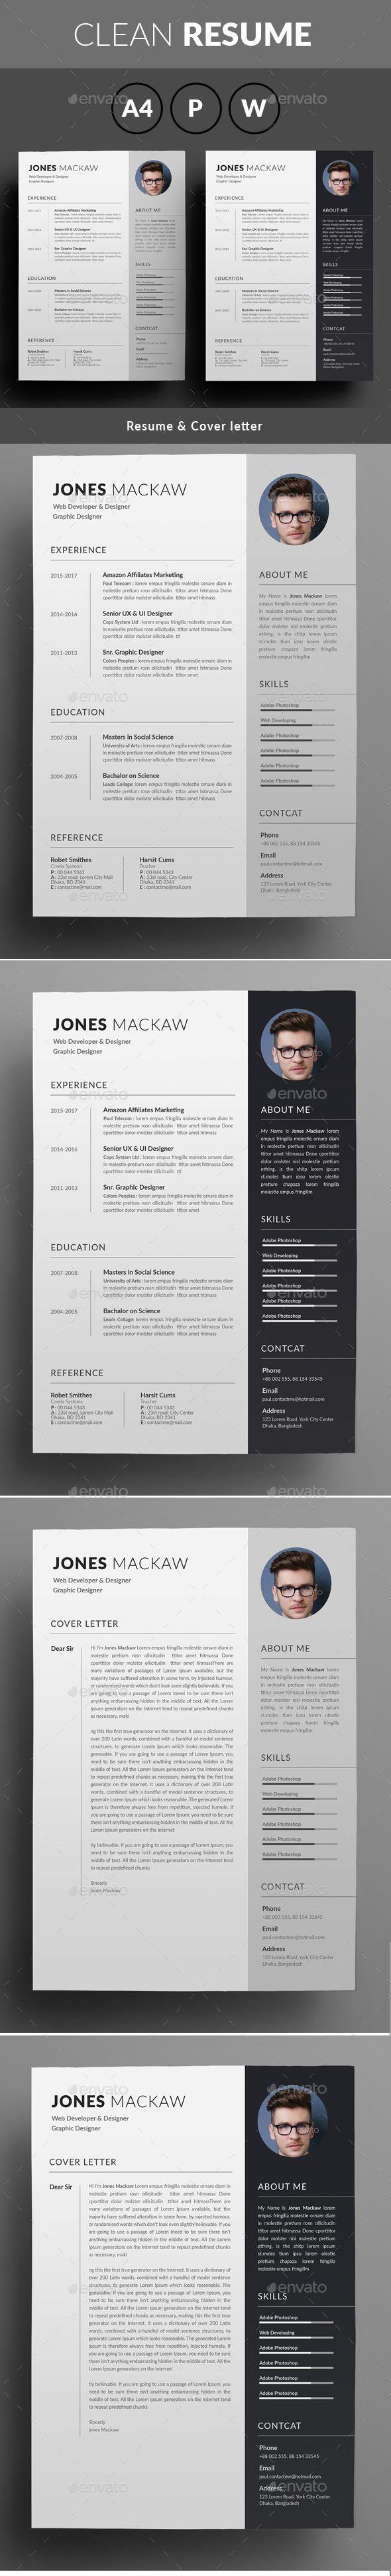 1003 best Resume Design images on Pinterest